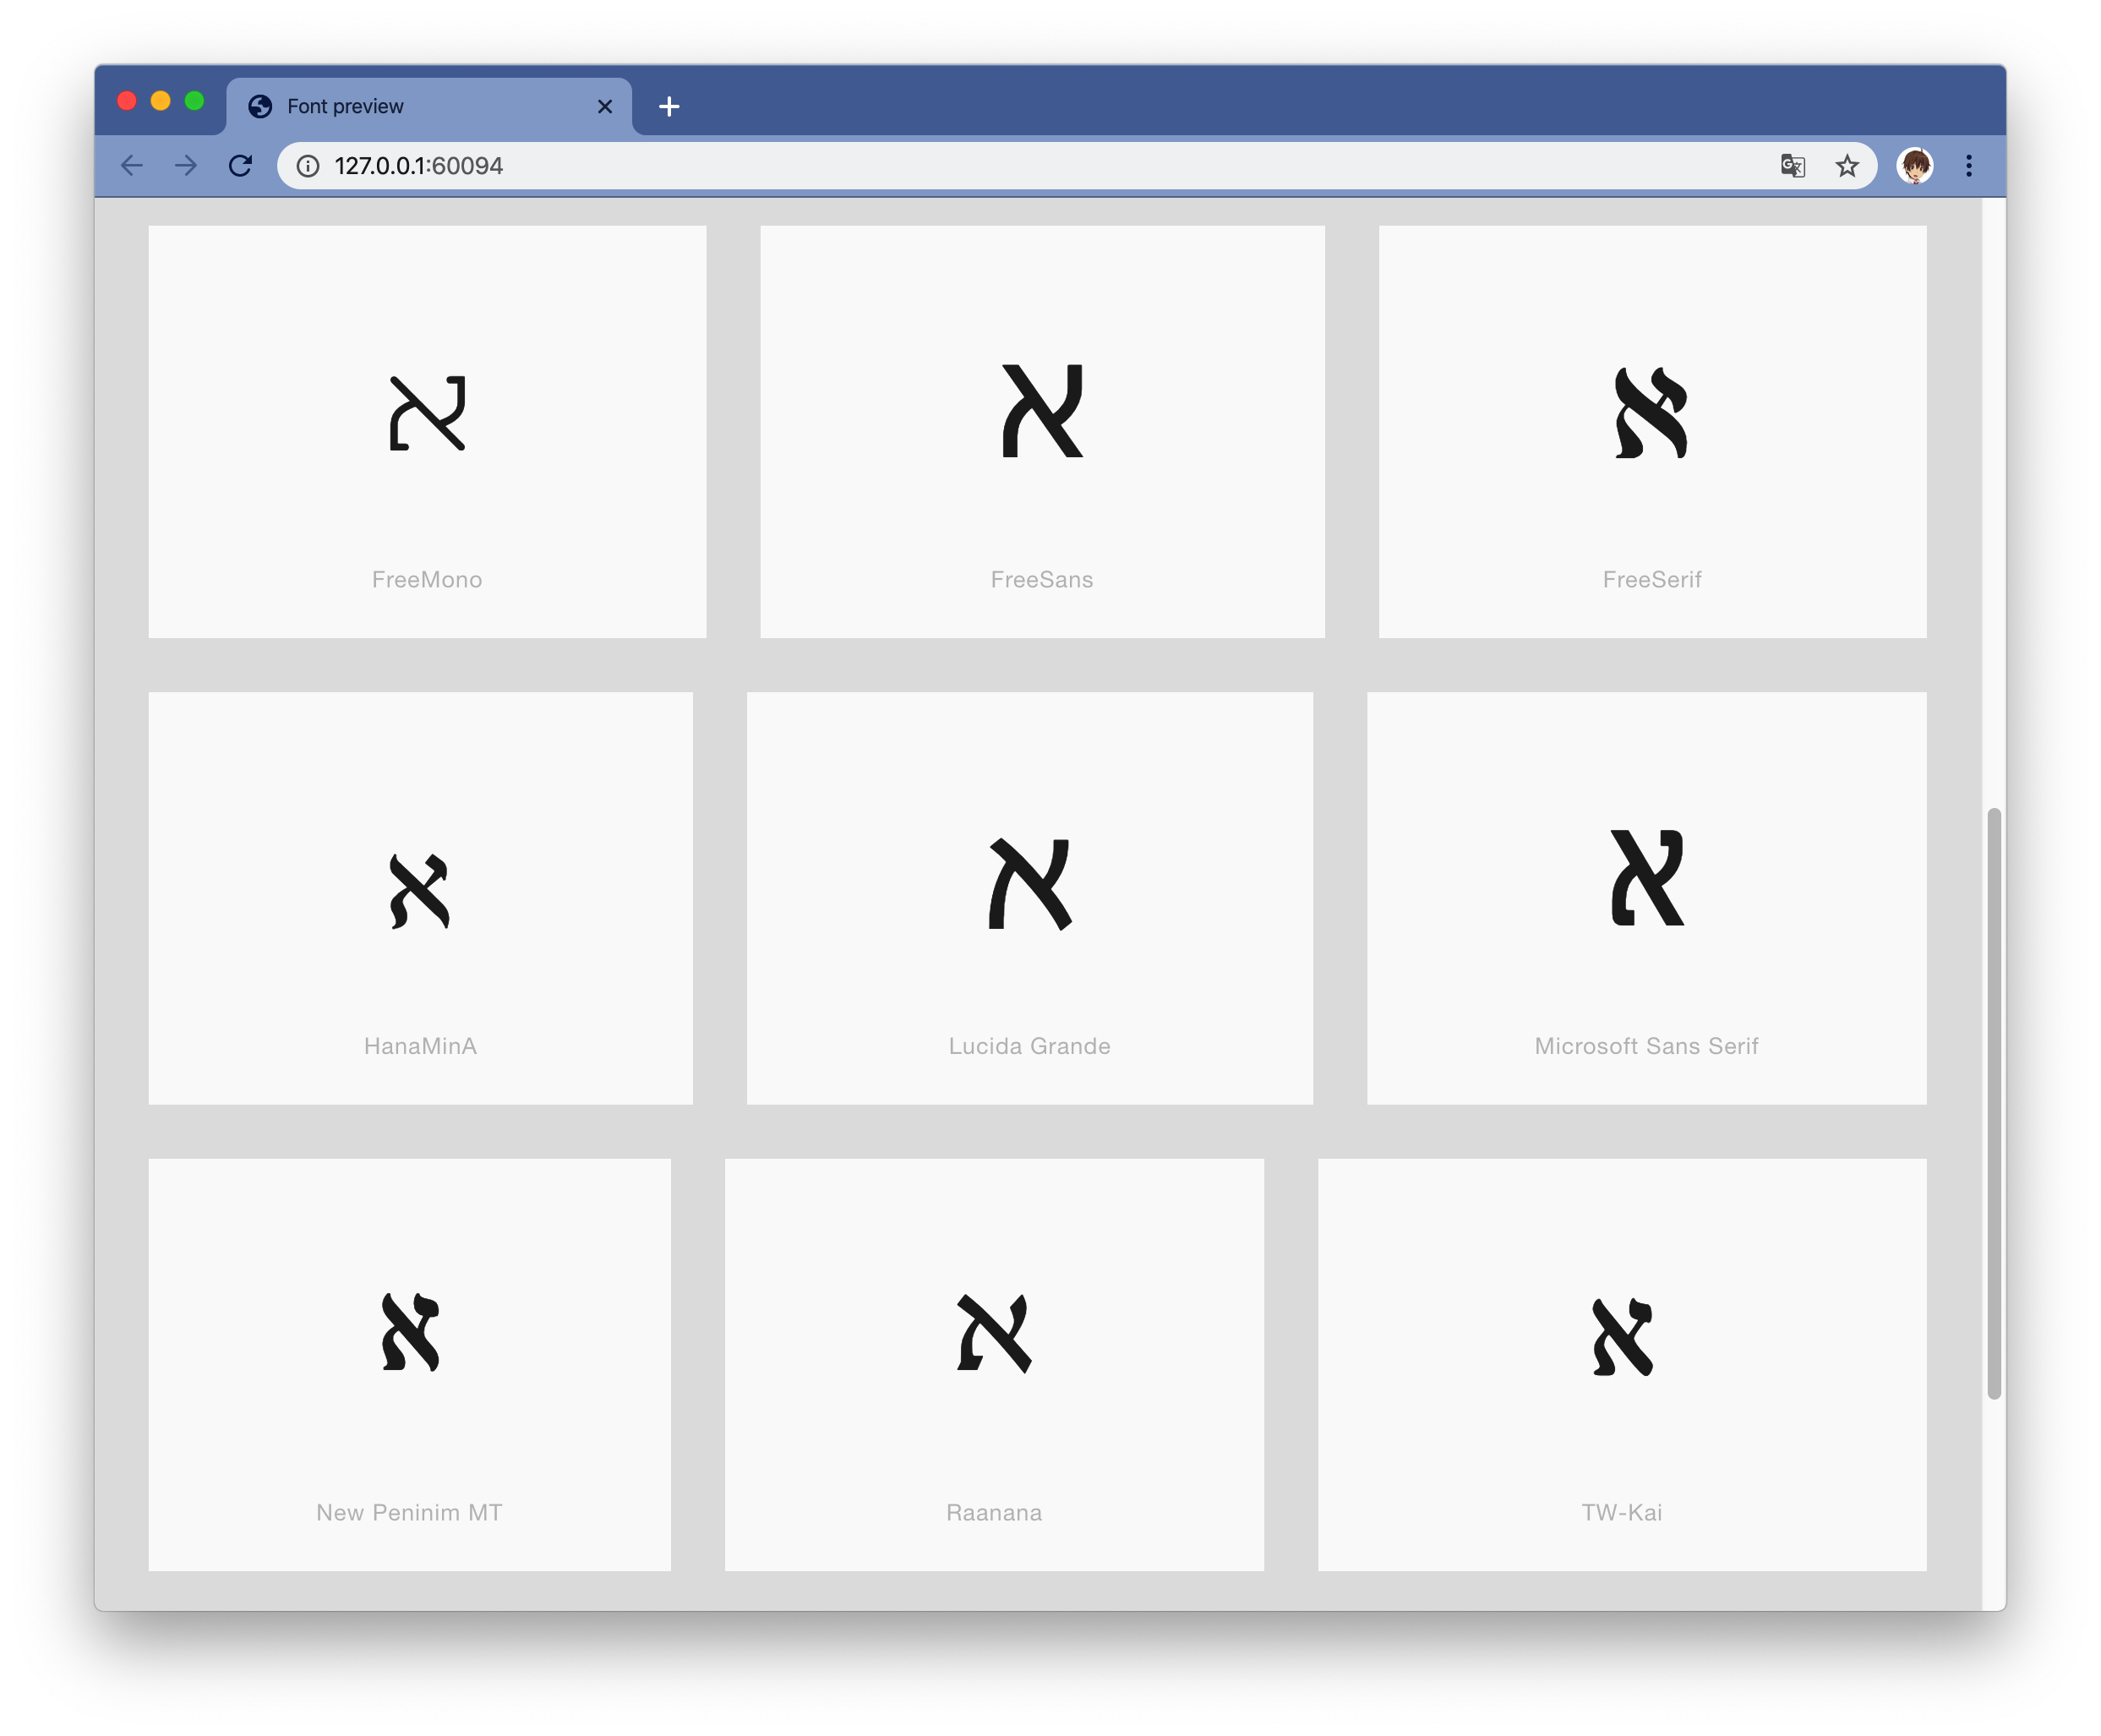 browser-preview-screenshot